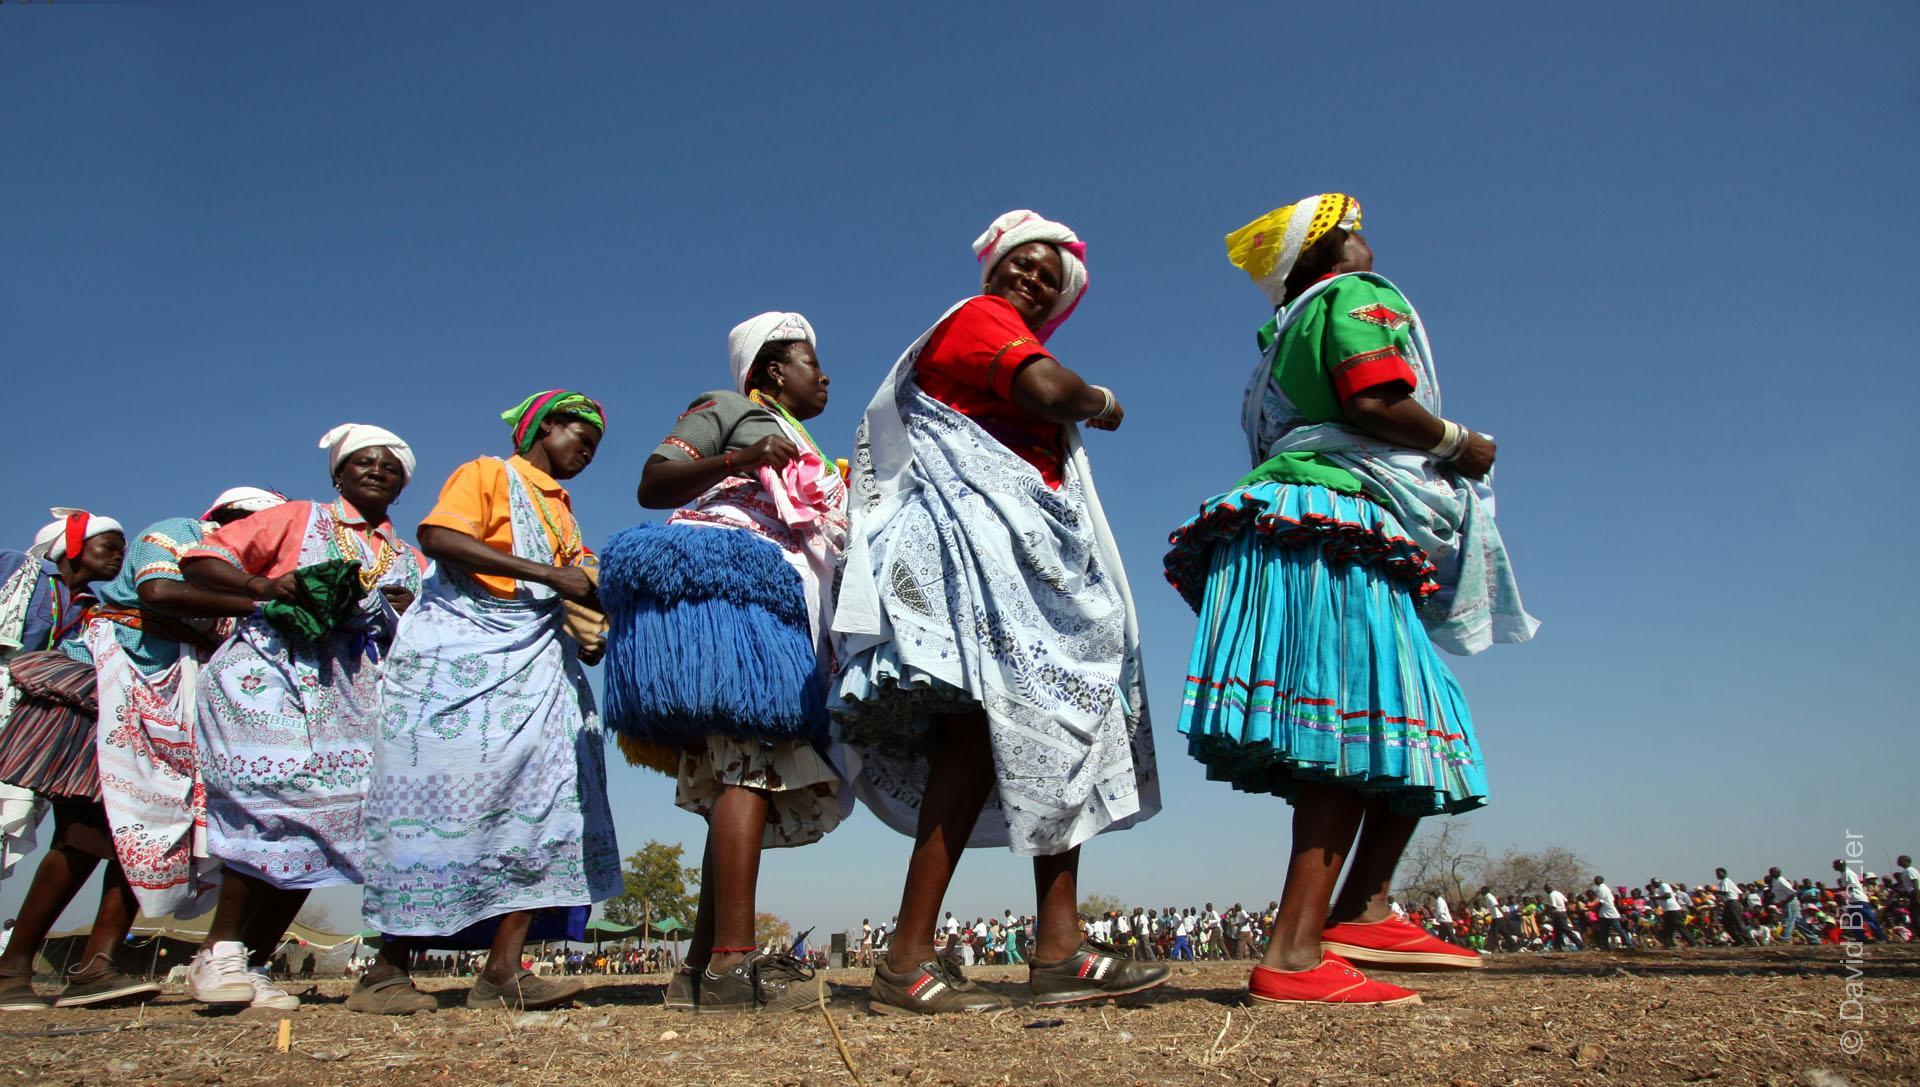 Shangaan women dancing during festival in Chiredzi, Zimbabwe